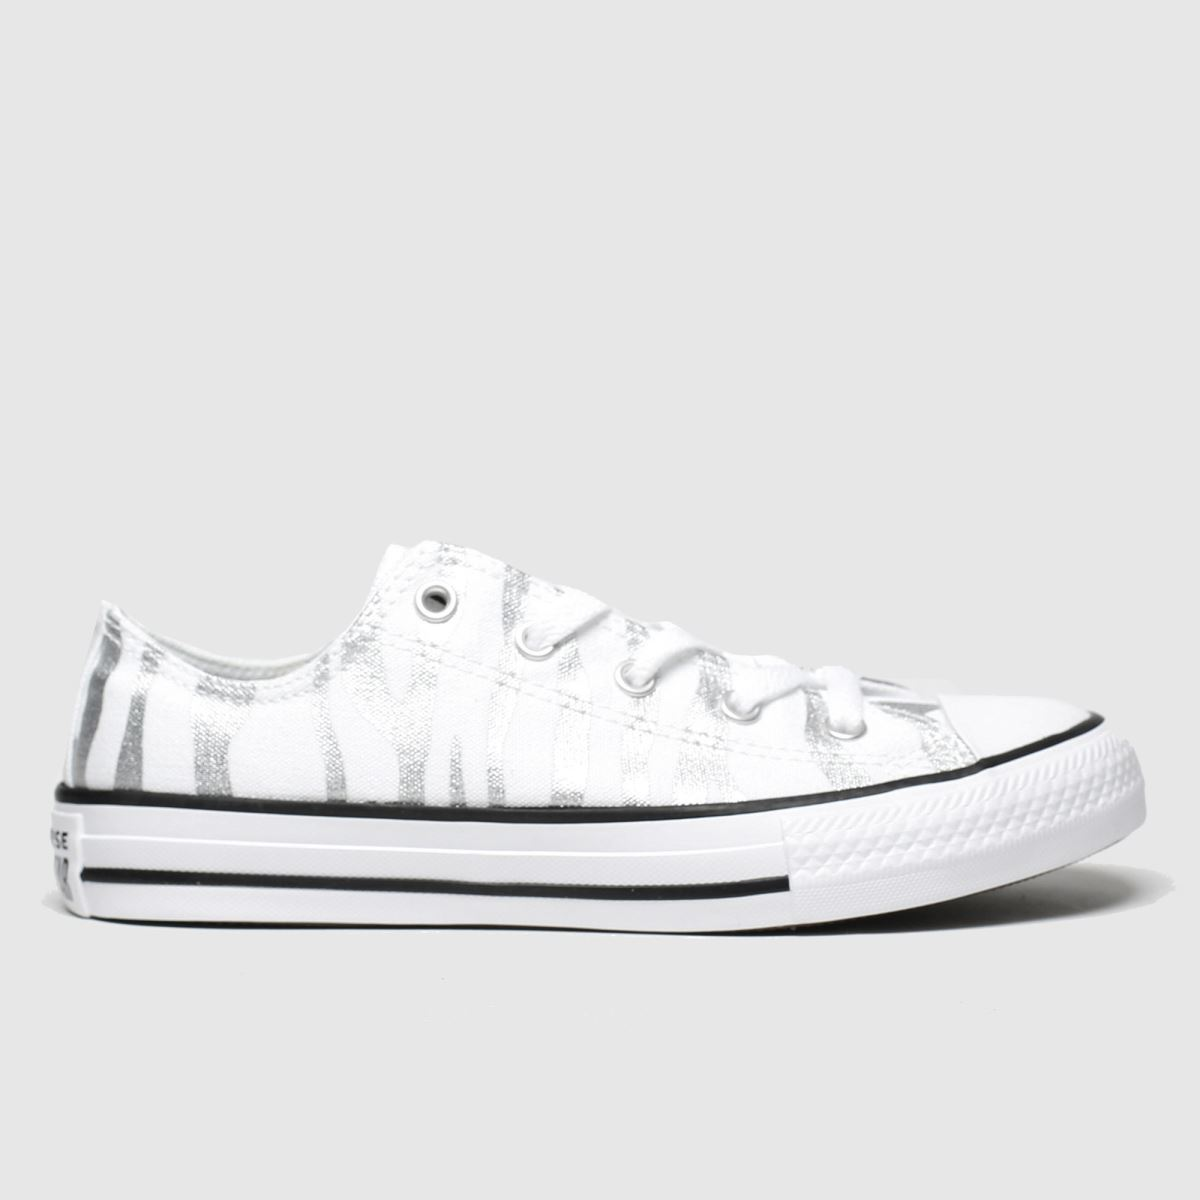 Girls white & silver converse all star zebra lo trainers | schuh